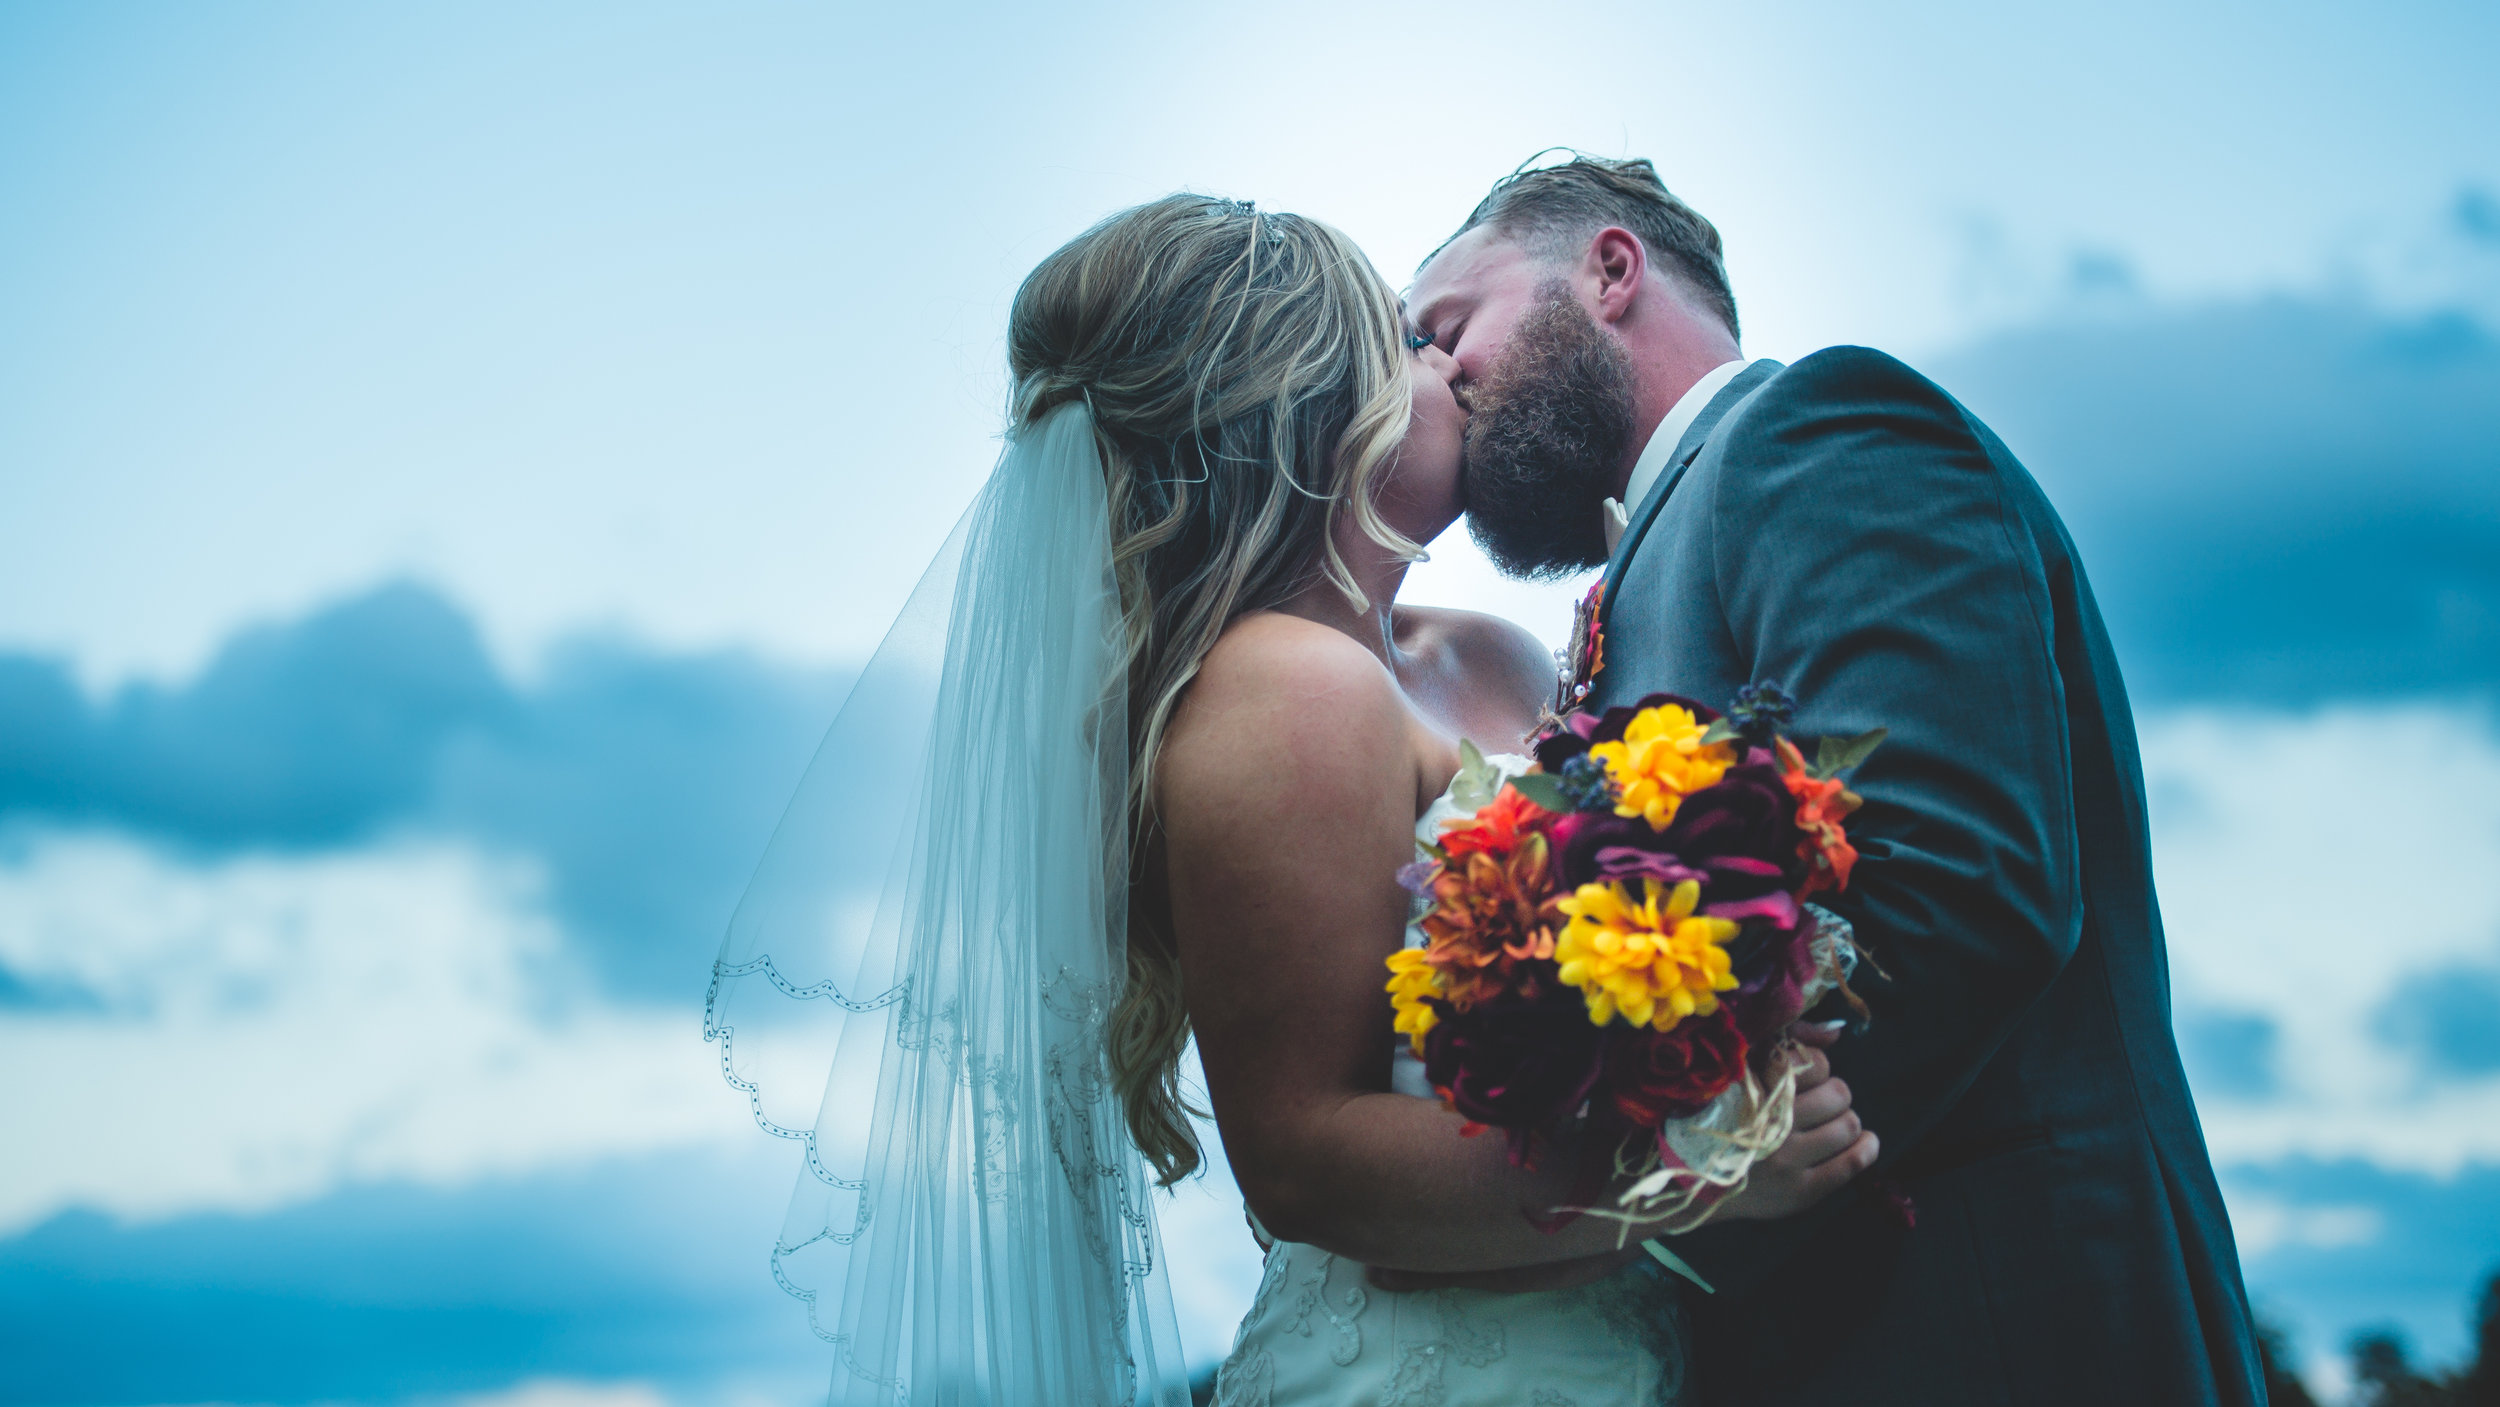 CCW - Creative Cure Weddings - Marissa and Nick - Southern Illinois Wedding Photography-8.jpg